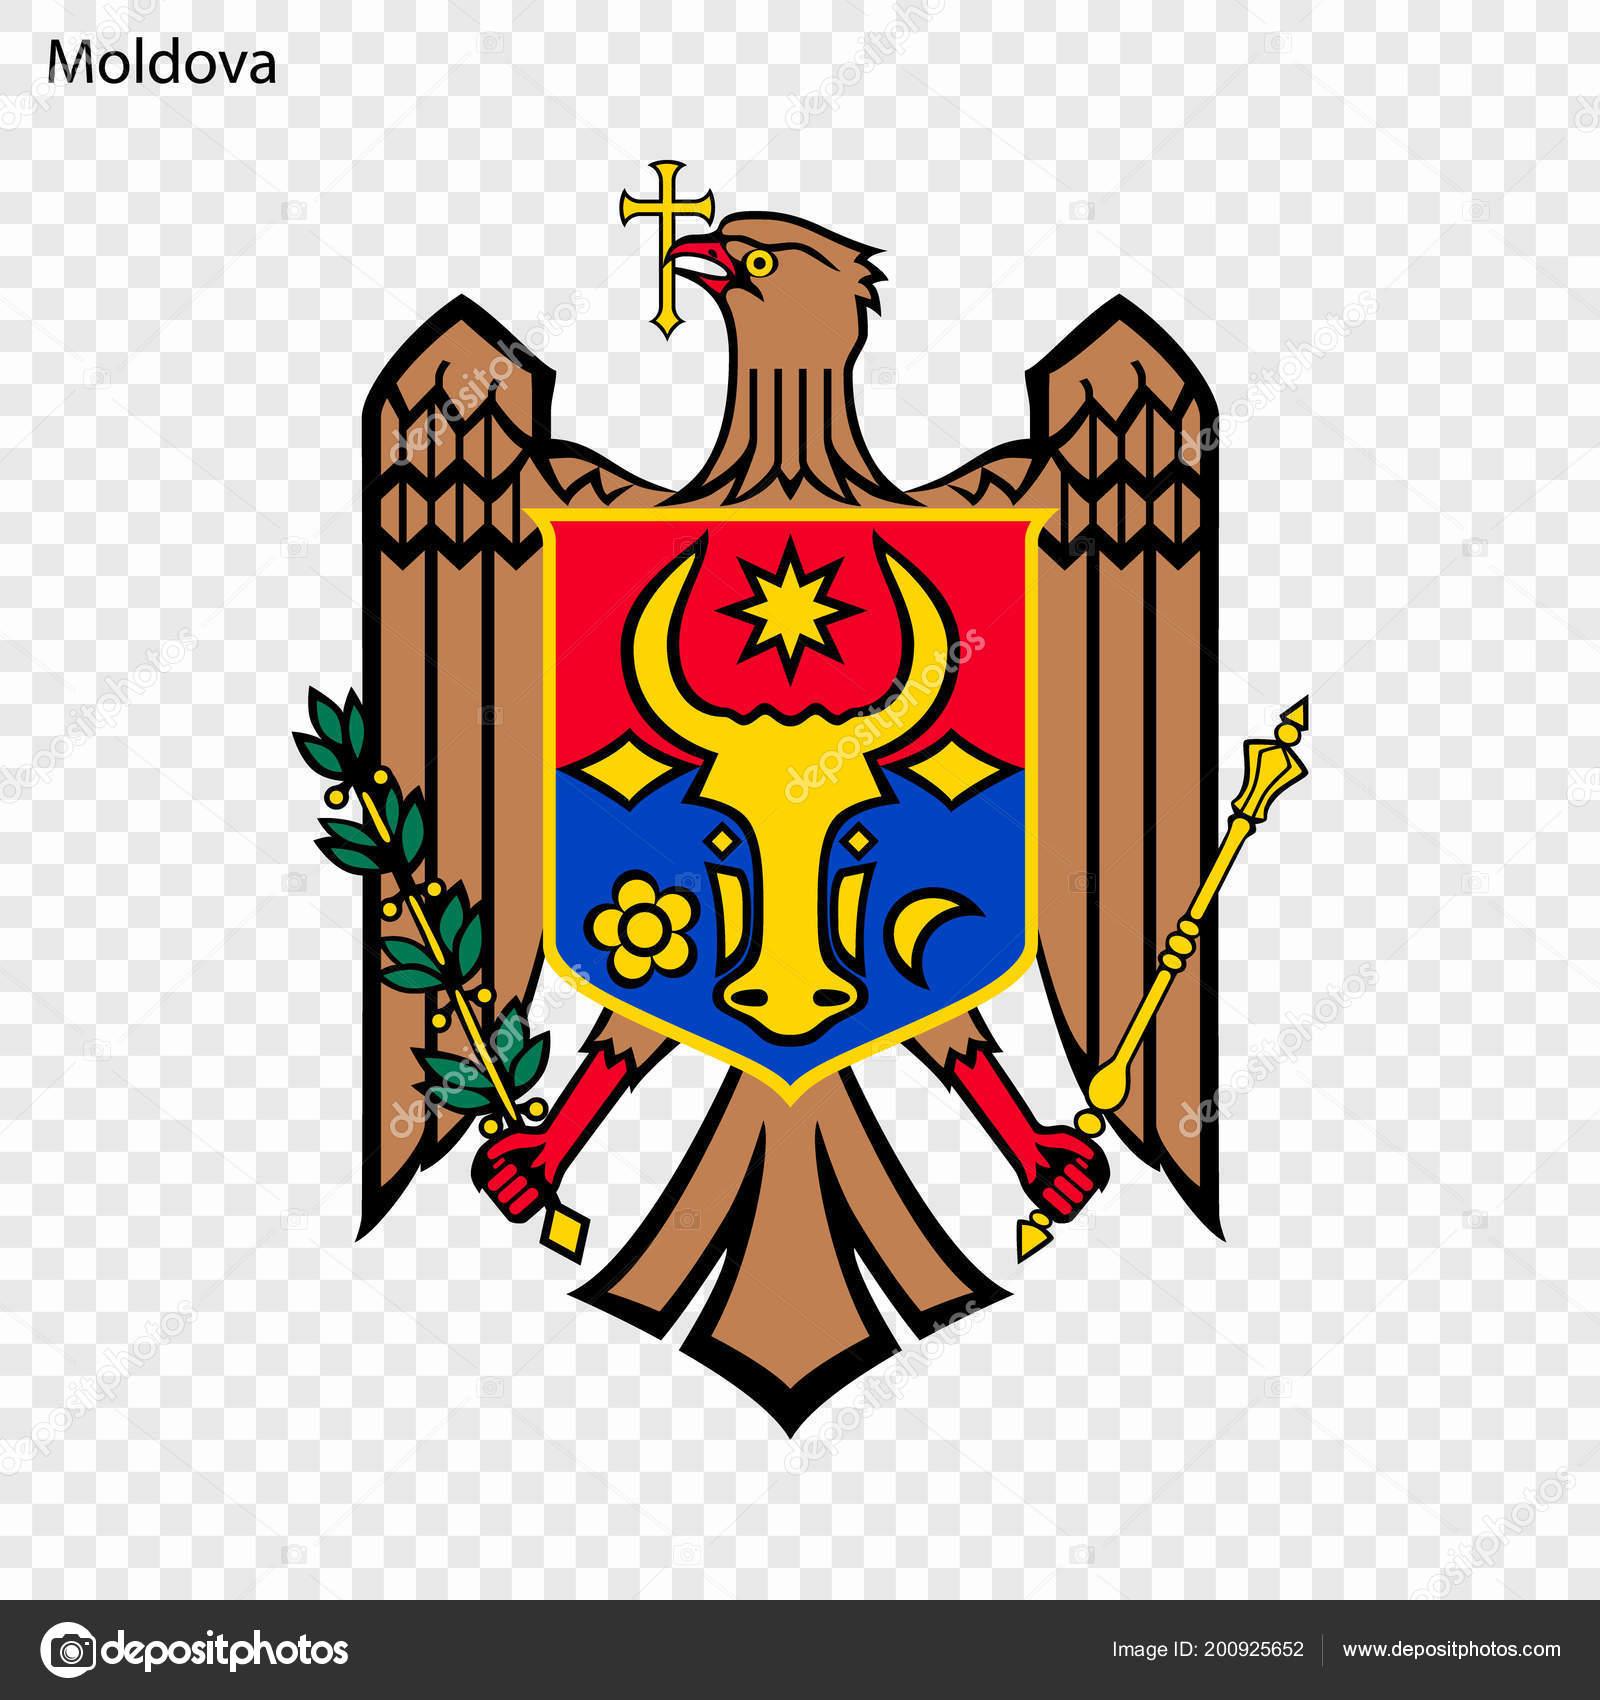 печати сетевом герб молдавии фото характеристики